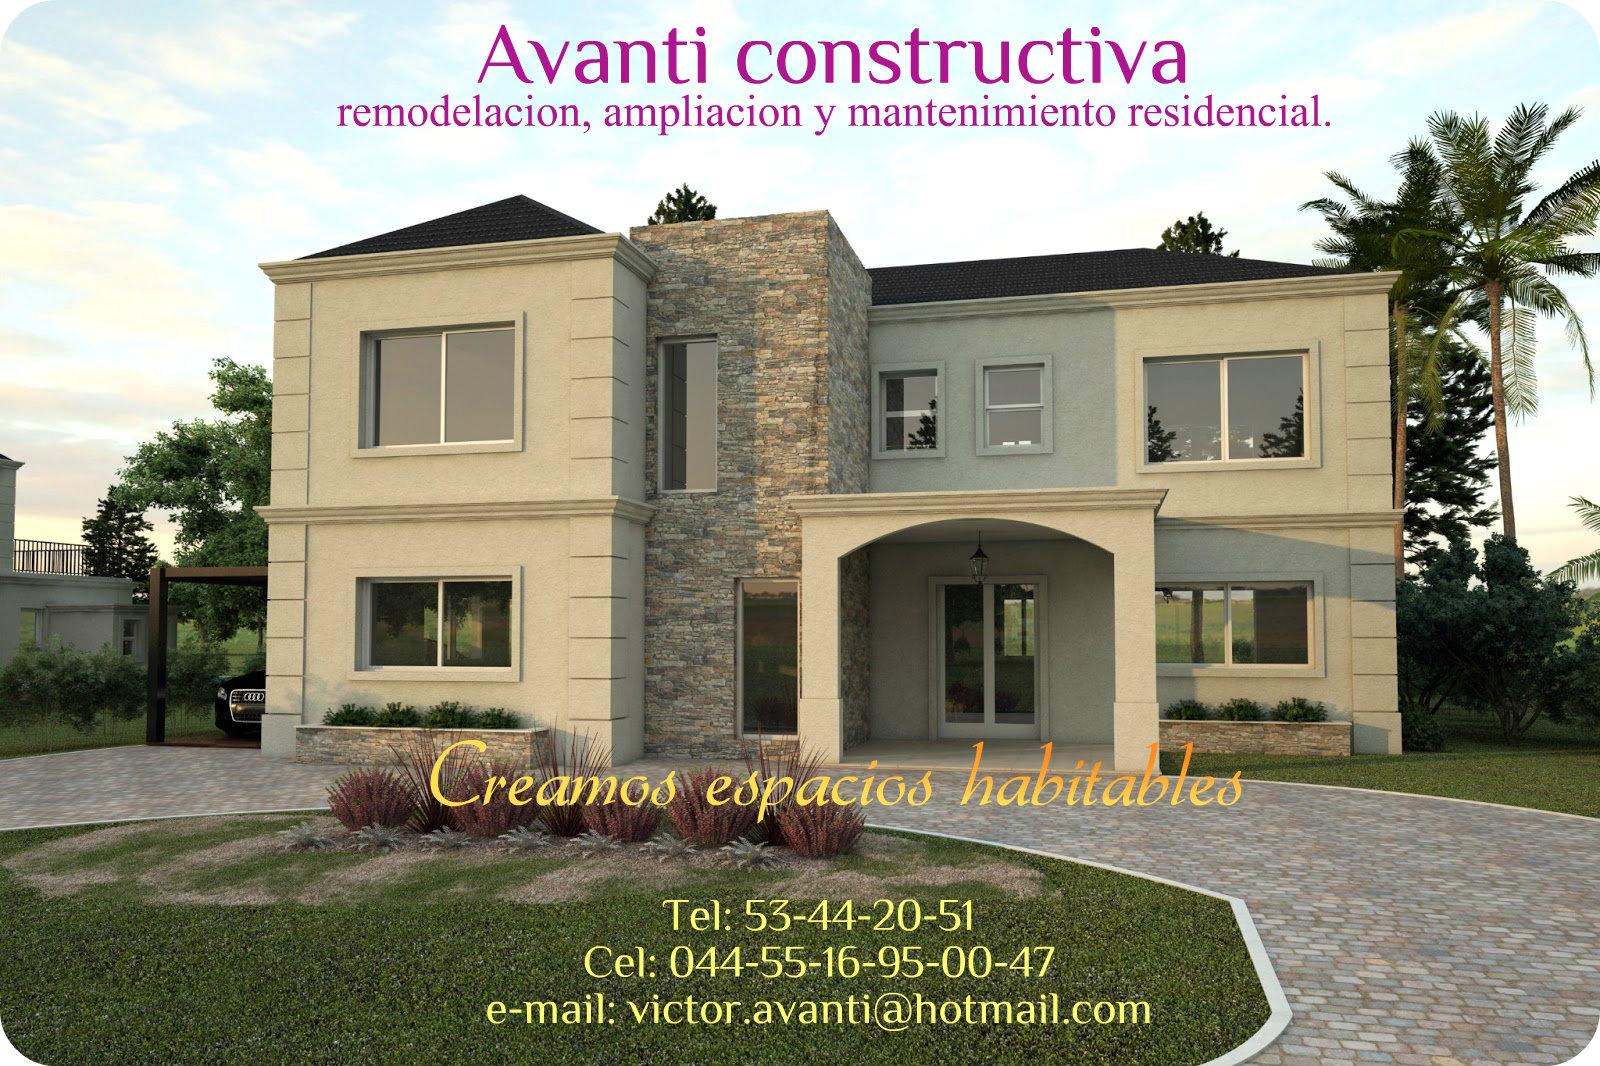 Avanti Constructiva